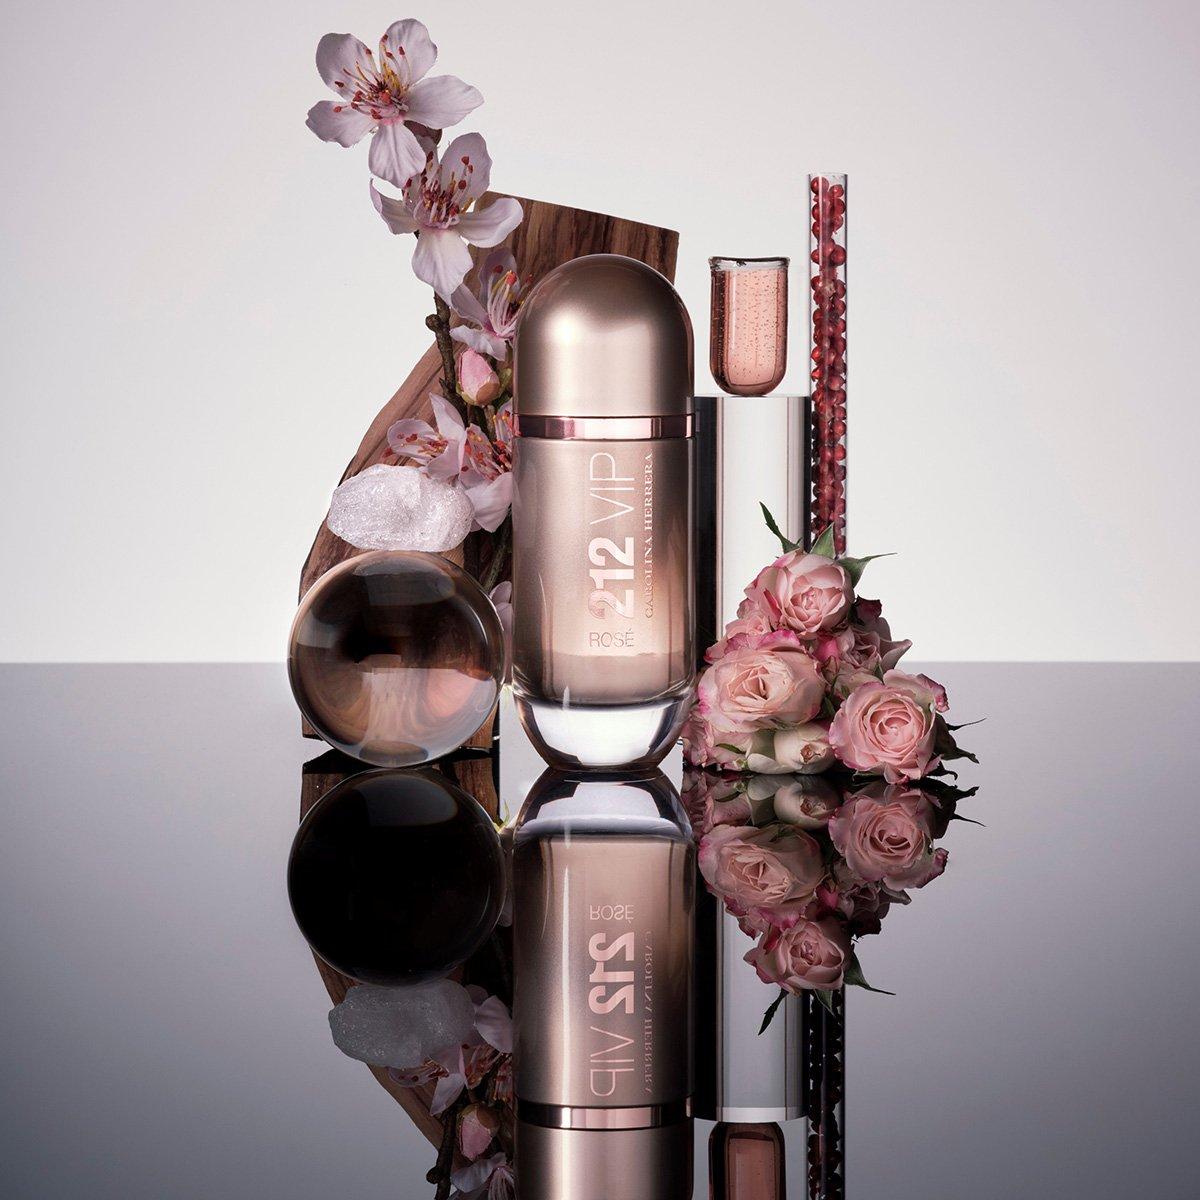 Perfume Feminino 212 VIP Rosé Carolina Herrera Eau de Parfum 50ml - 2